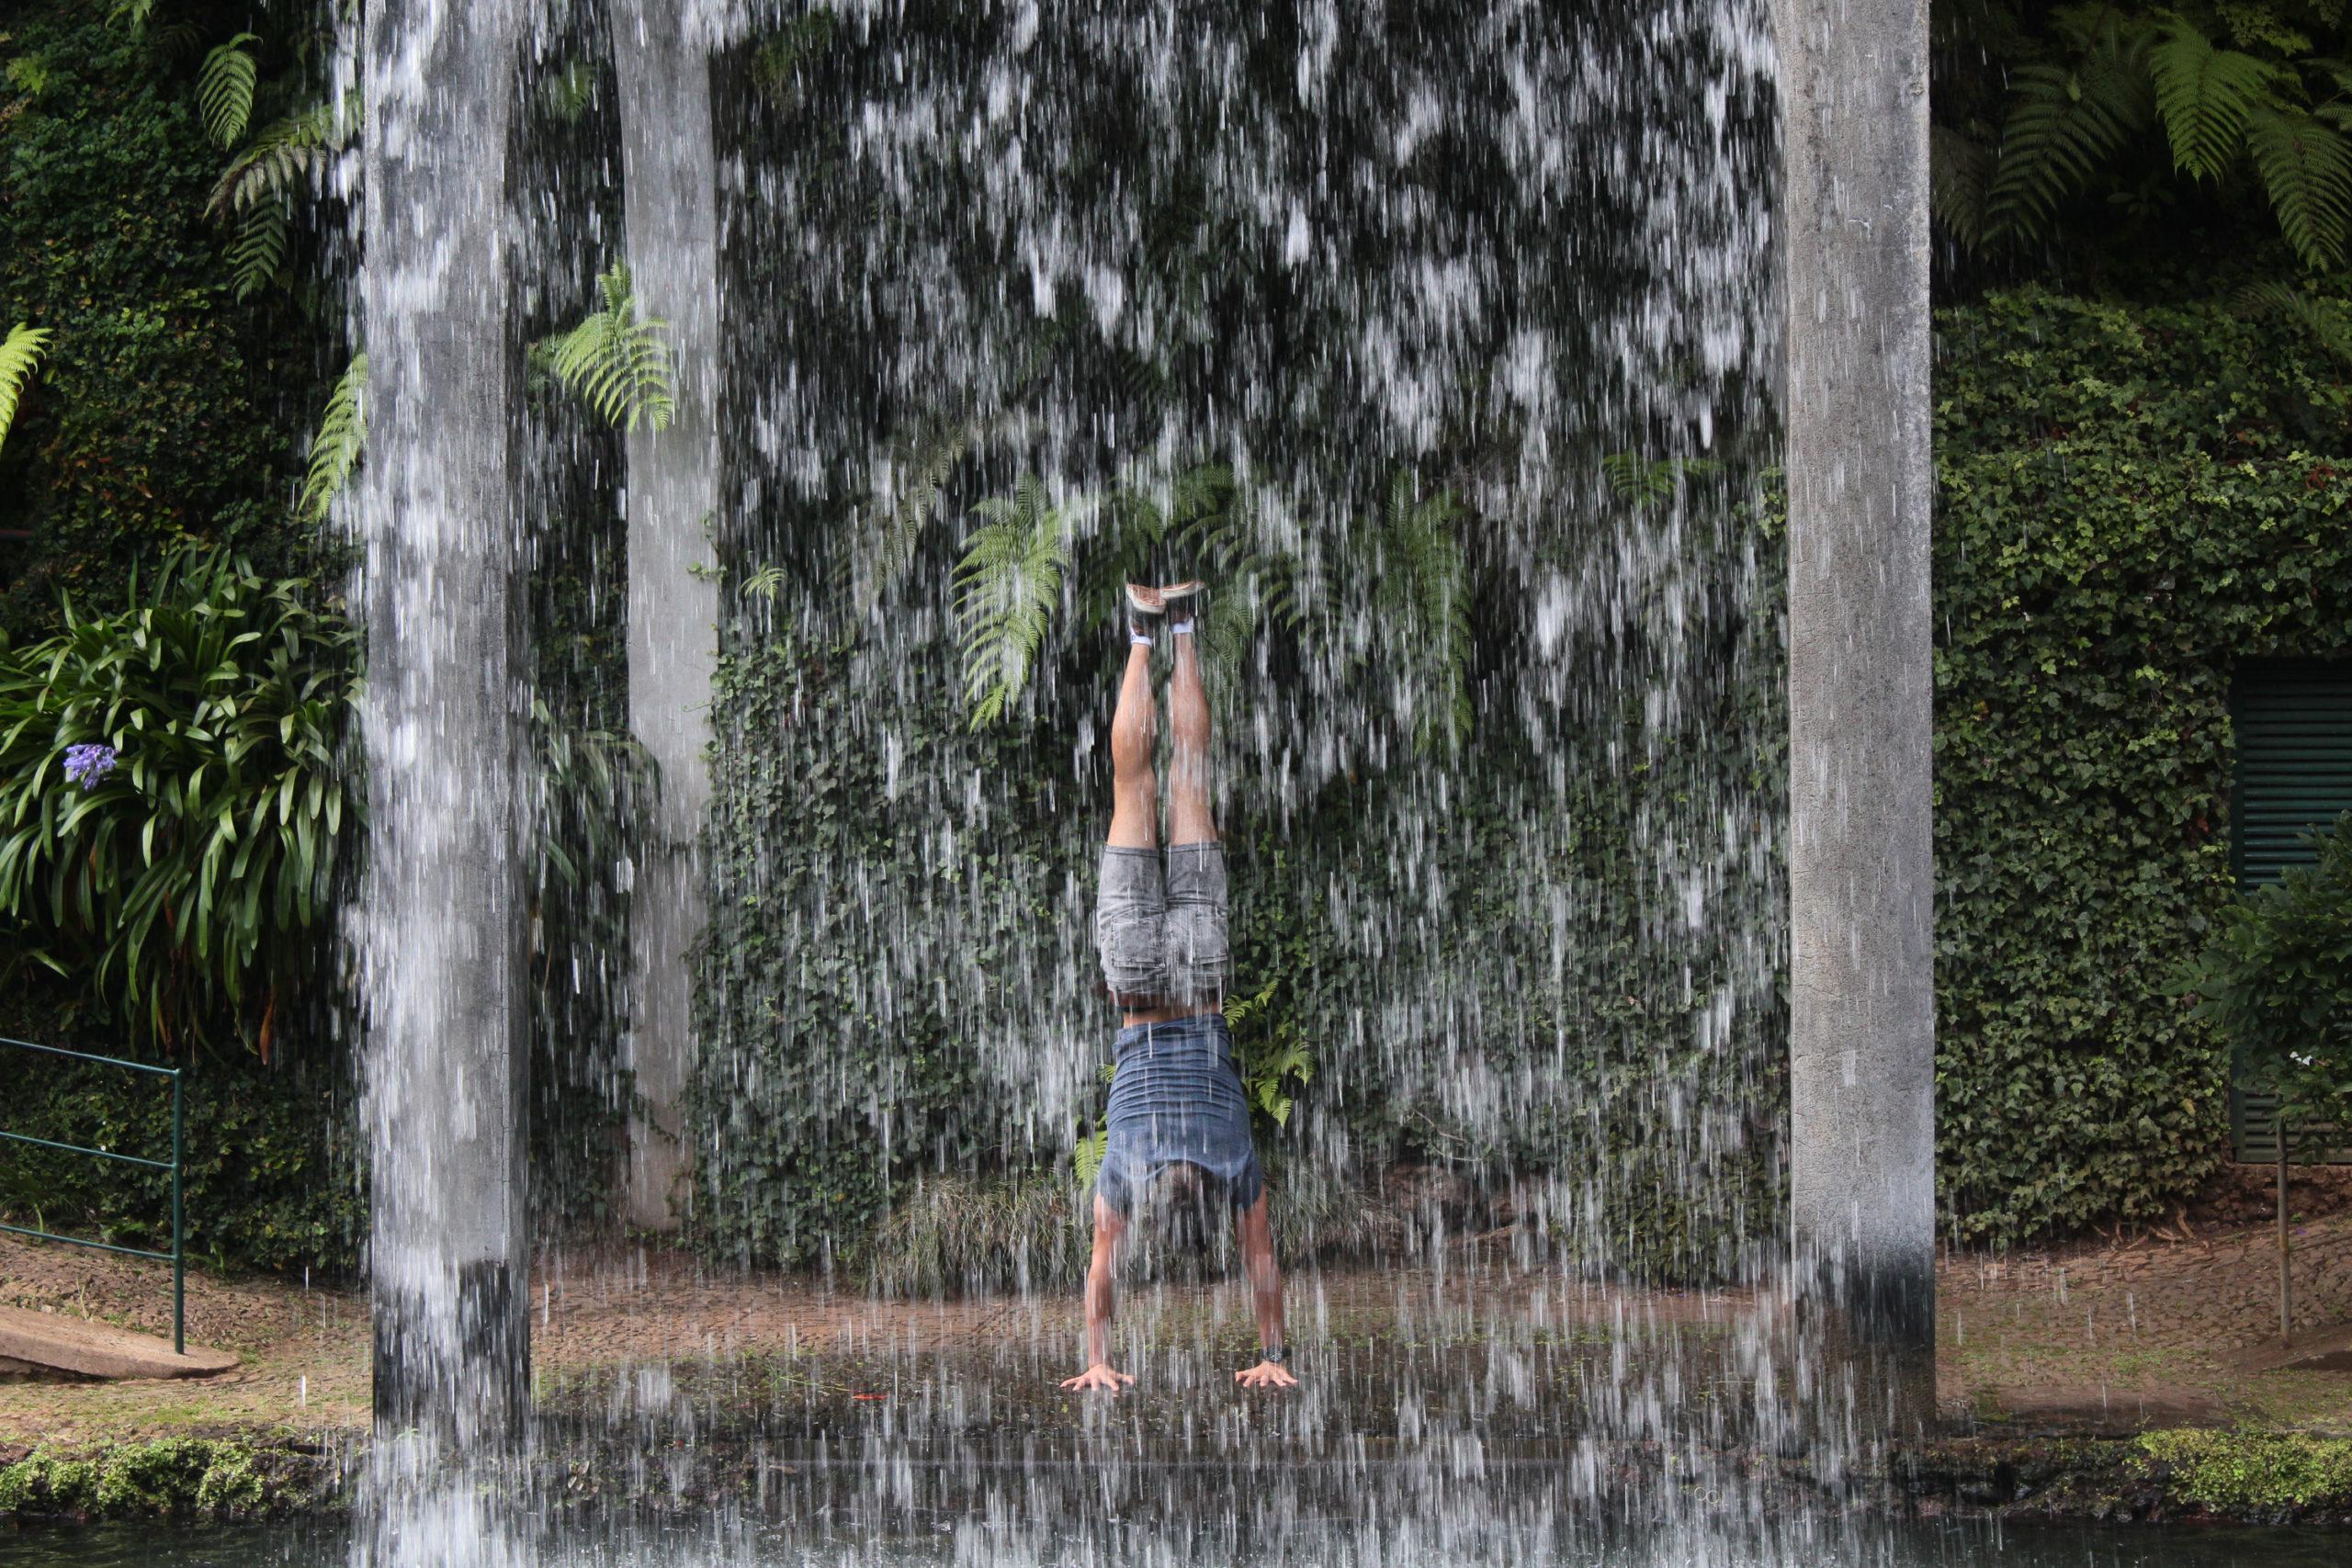 madera fontanna wodospad